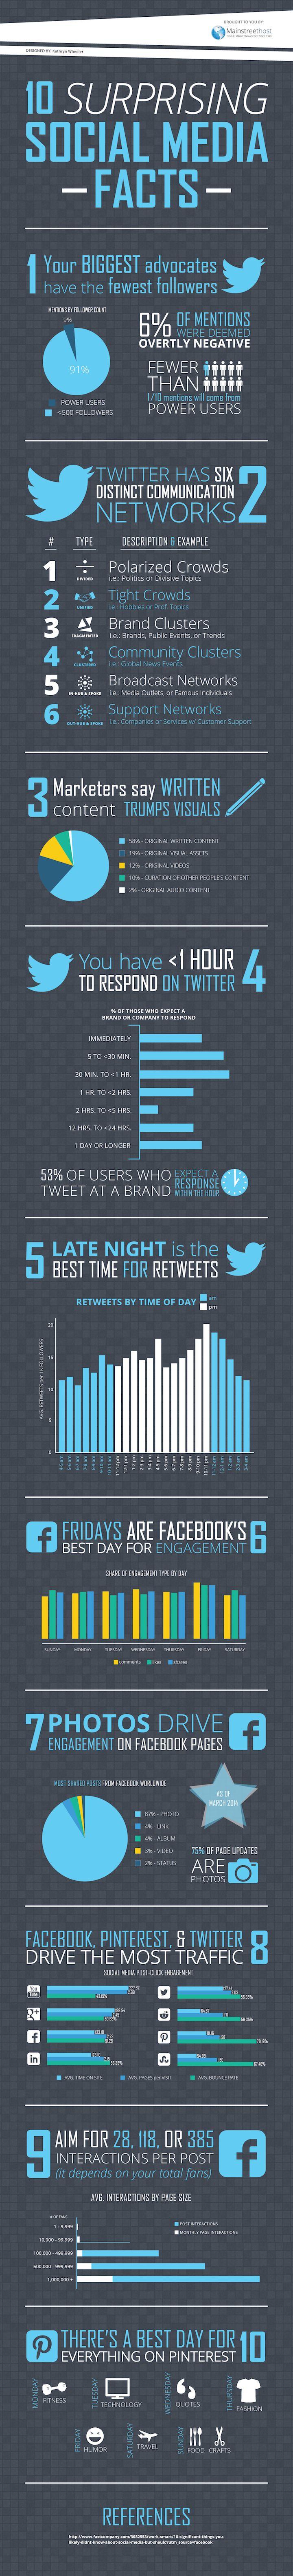 10 Surprising Social Media Facts #Infographic | via #BornToBeSocial